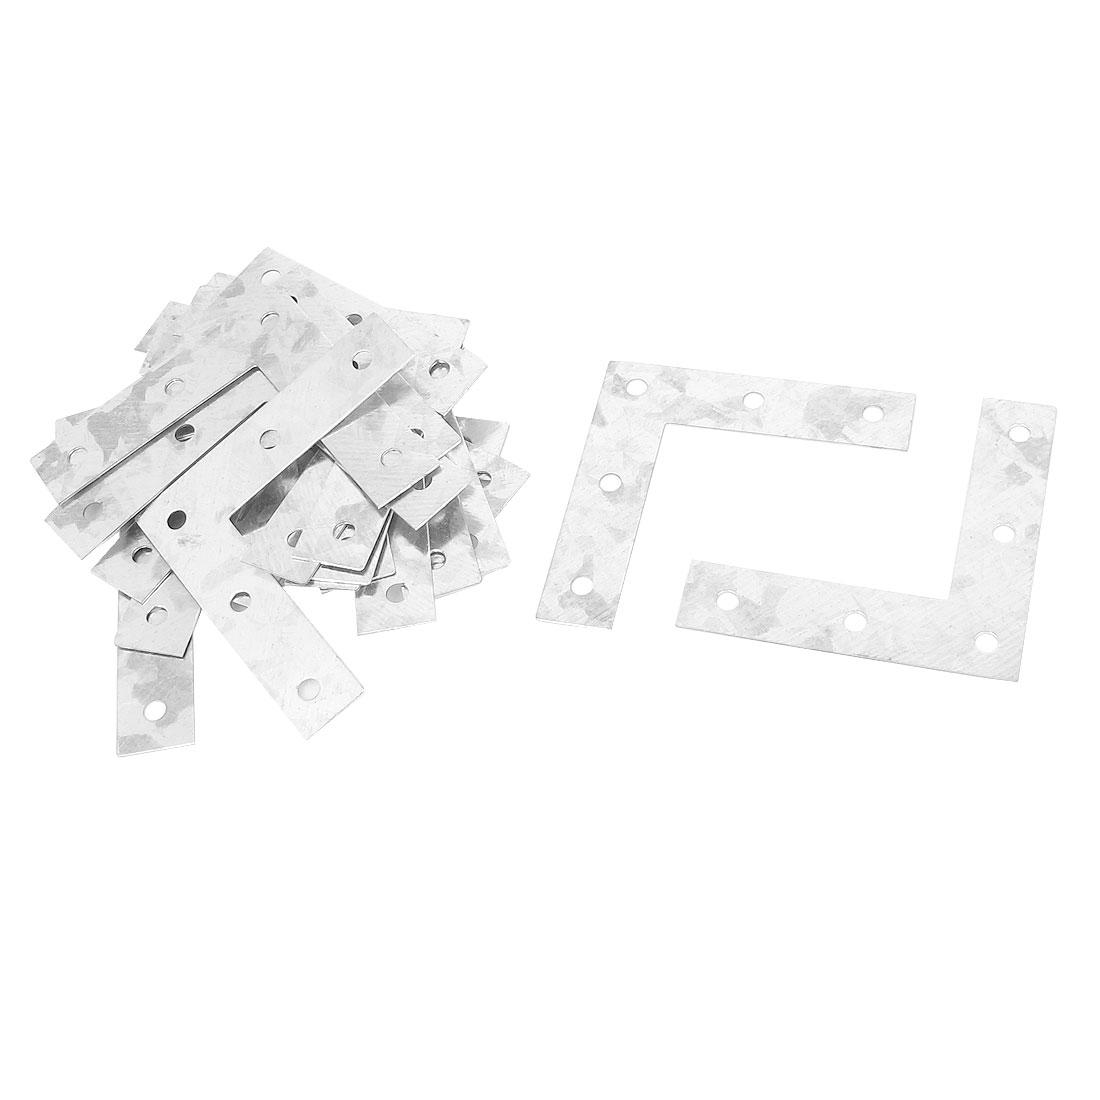 75mmx75mm Angle Plate Corner Brace Metal Flat L Shape Repair Bracket 20pcs